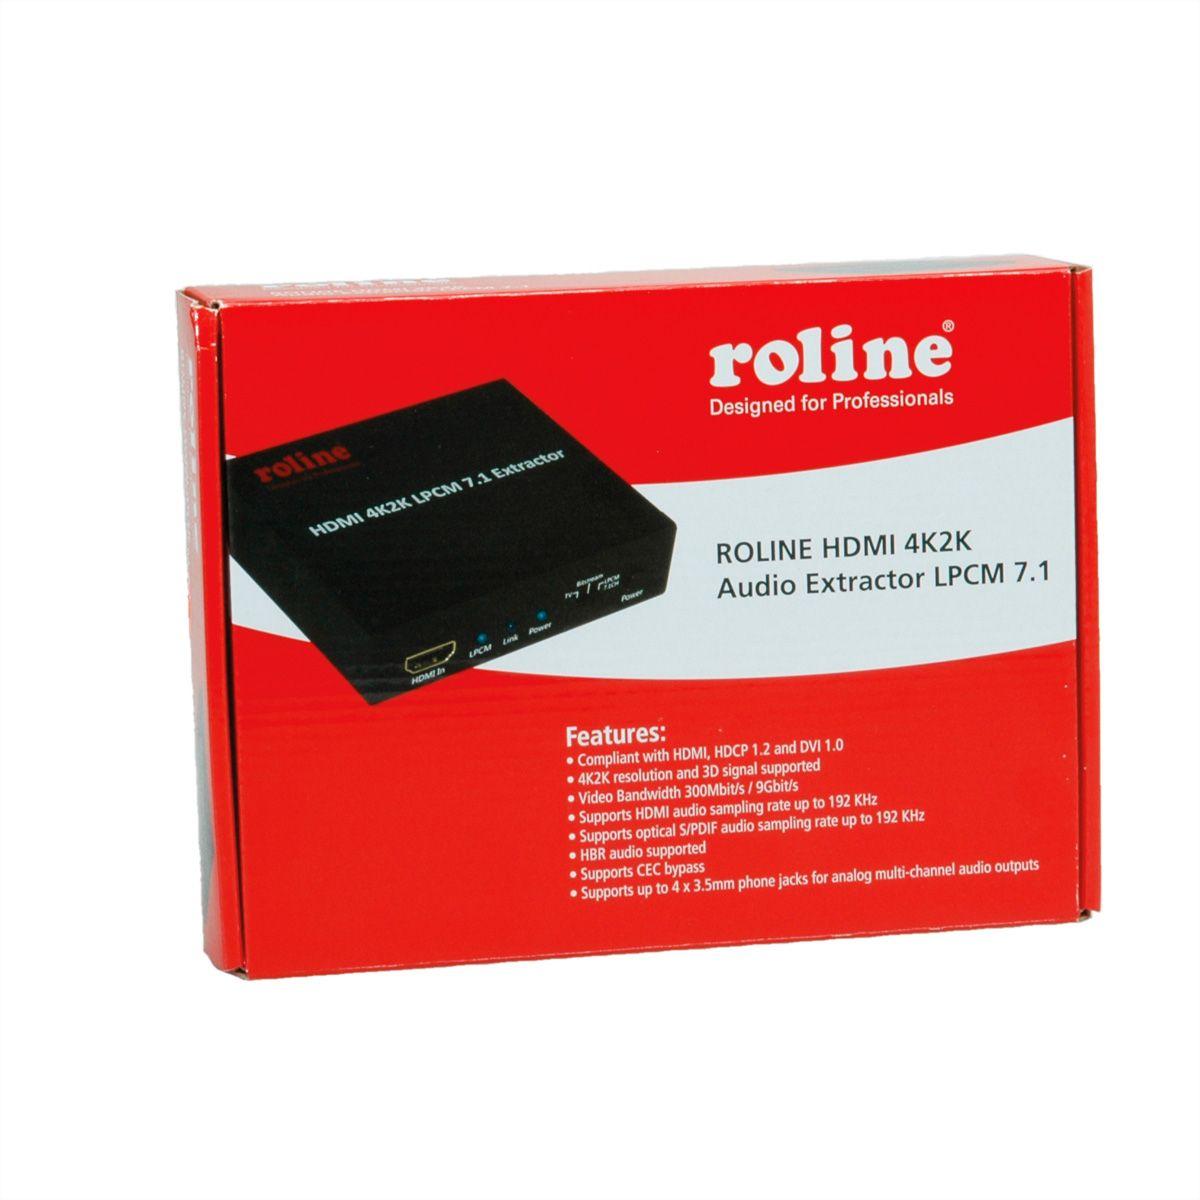 ROLINE HDMI 4K Audio Extractor LPCM 7 1 - SECOMP International